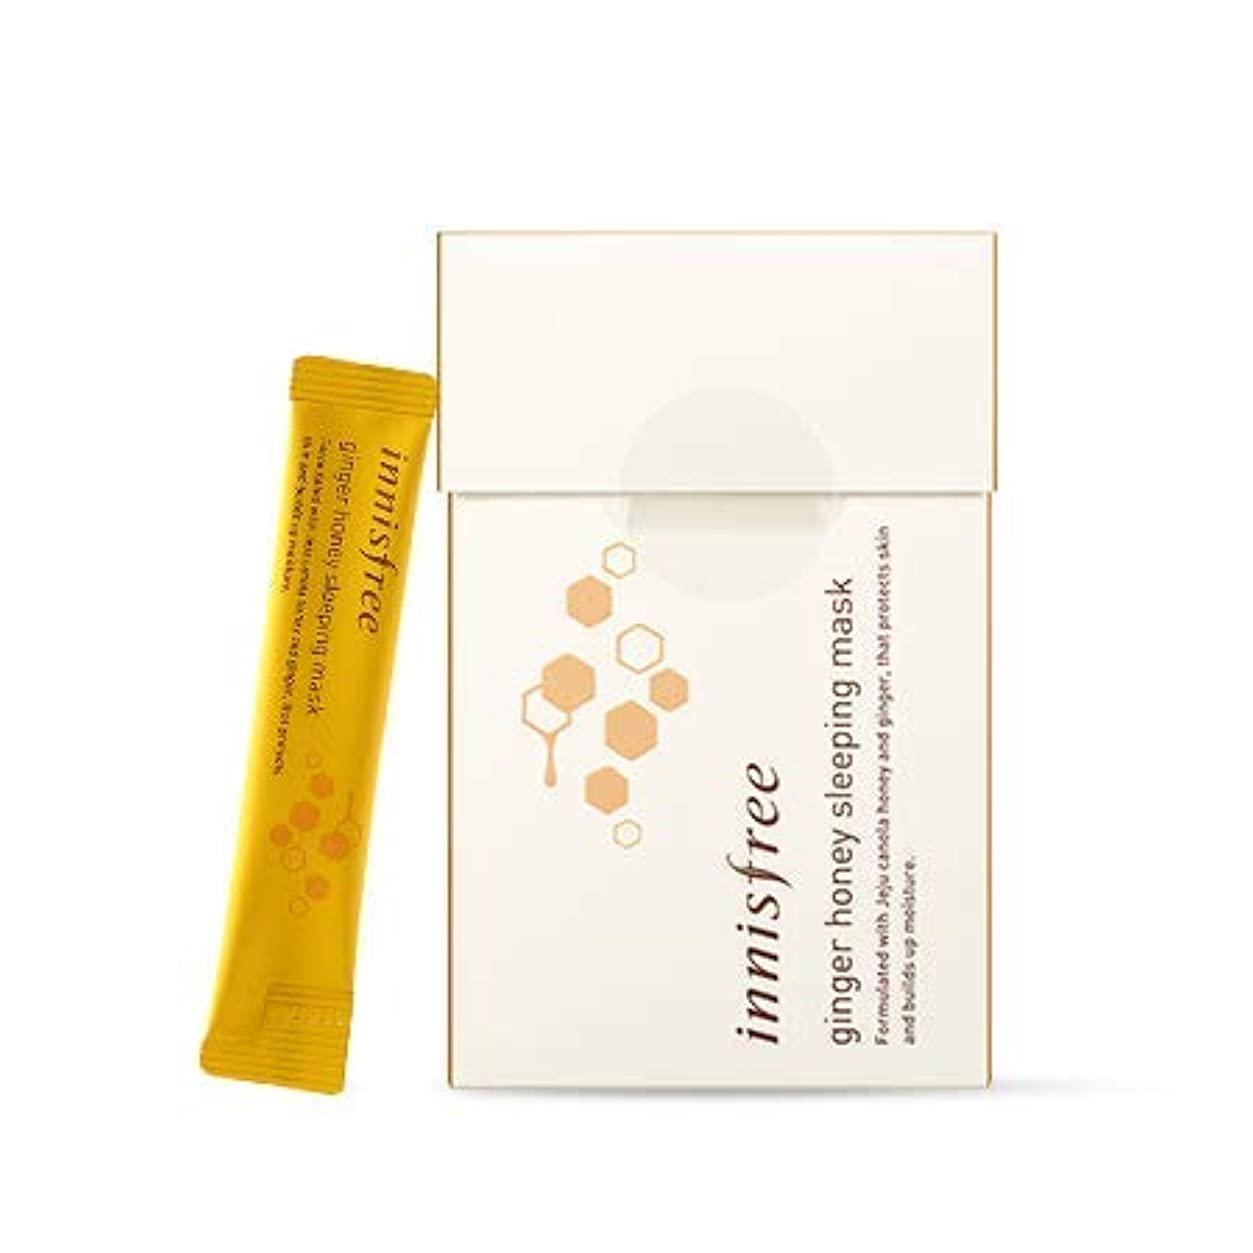 innisfree (イニスフリー) イニスフリージンジャーハニースリーピングマスク4mLx15EA / innisfree Ginger Honey Sleeping Mask 4mLx15EA [並行輸入品]